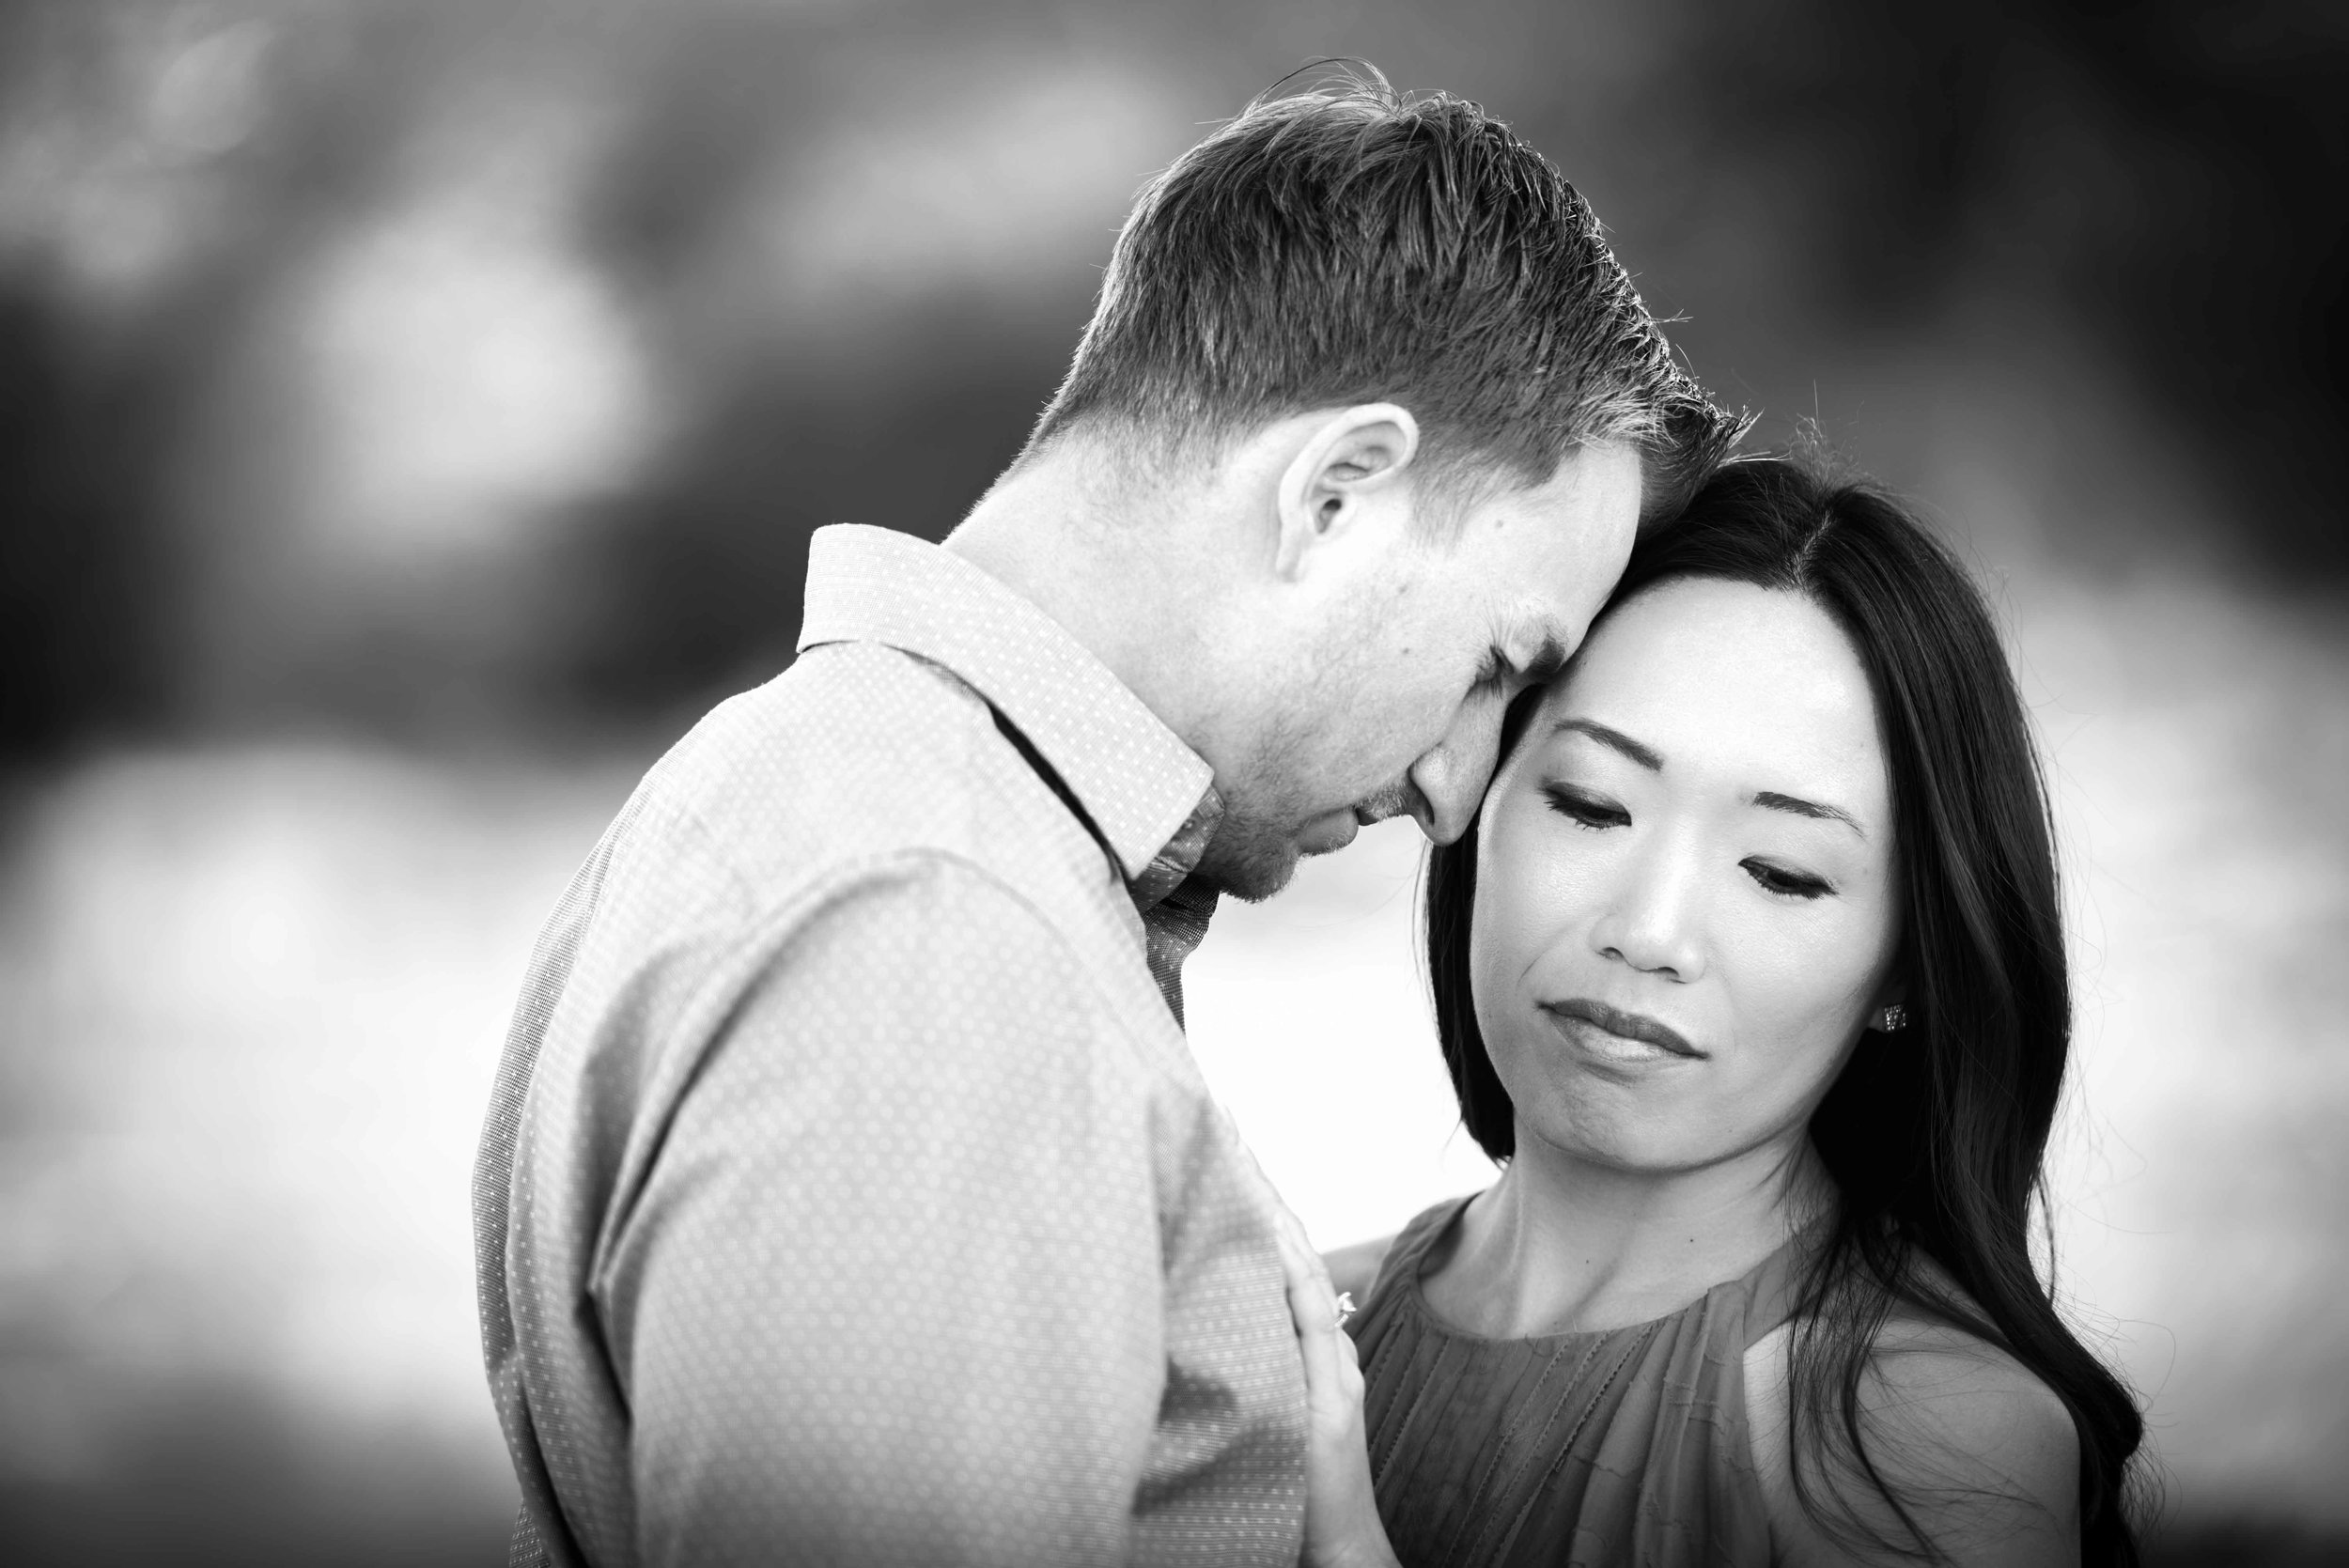 des-moines-wedding-photographer-79.jpg